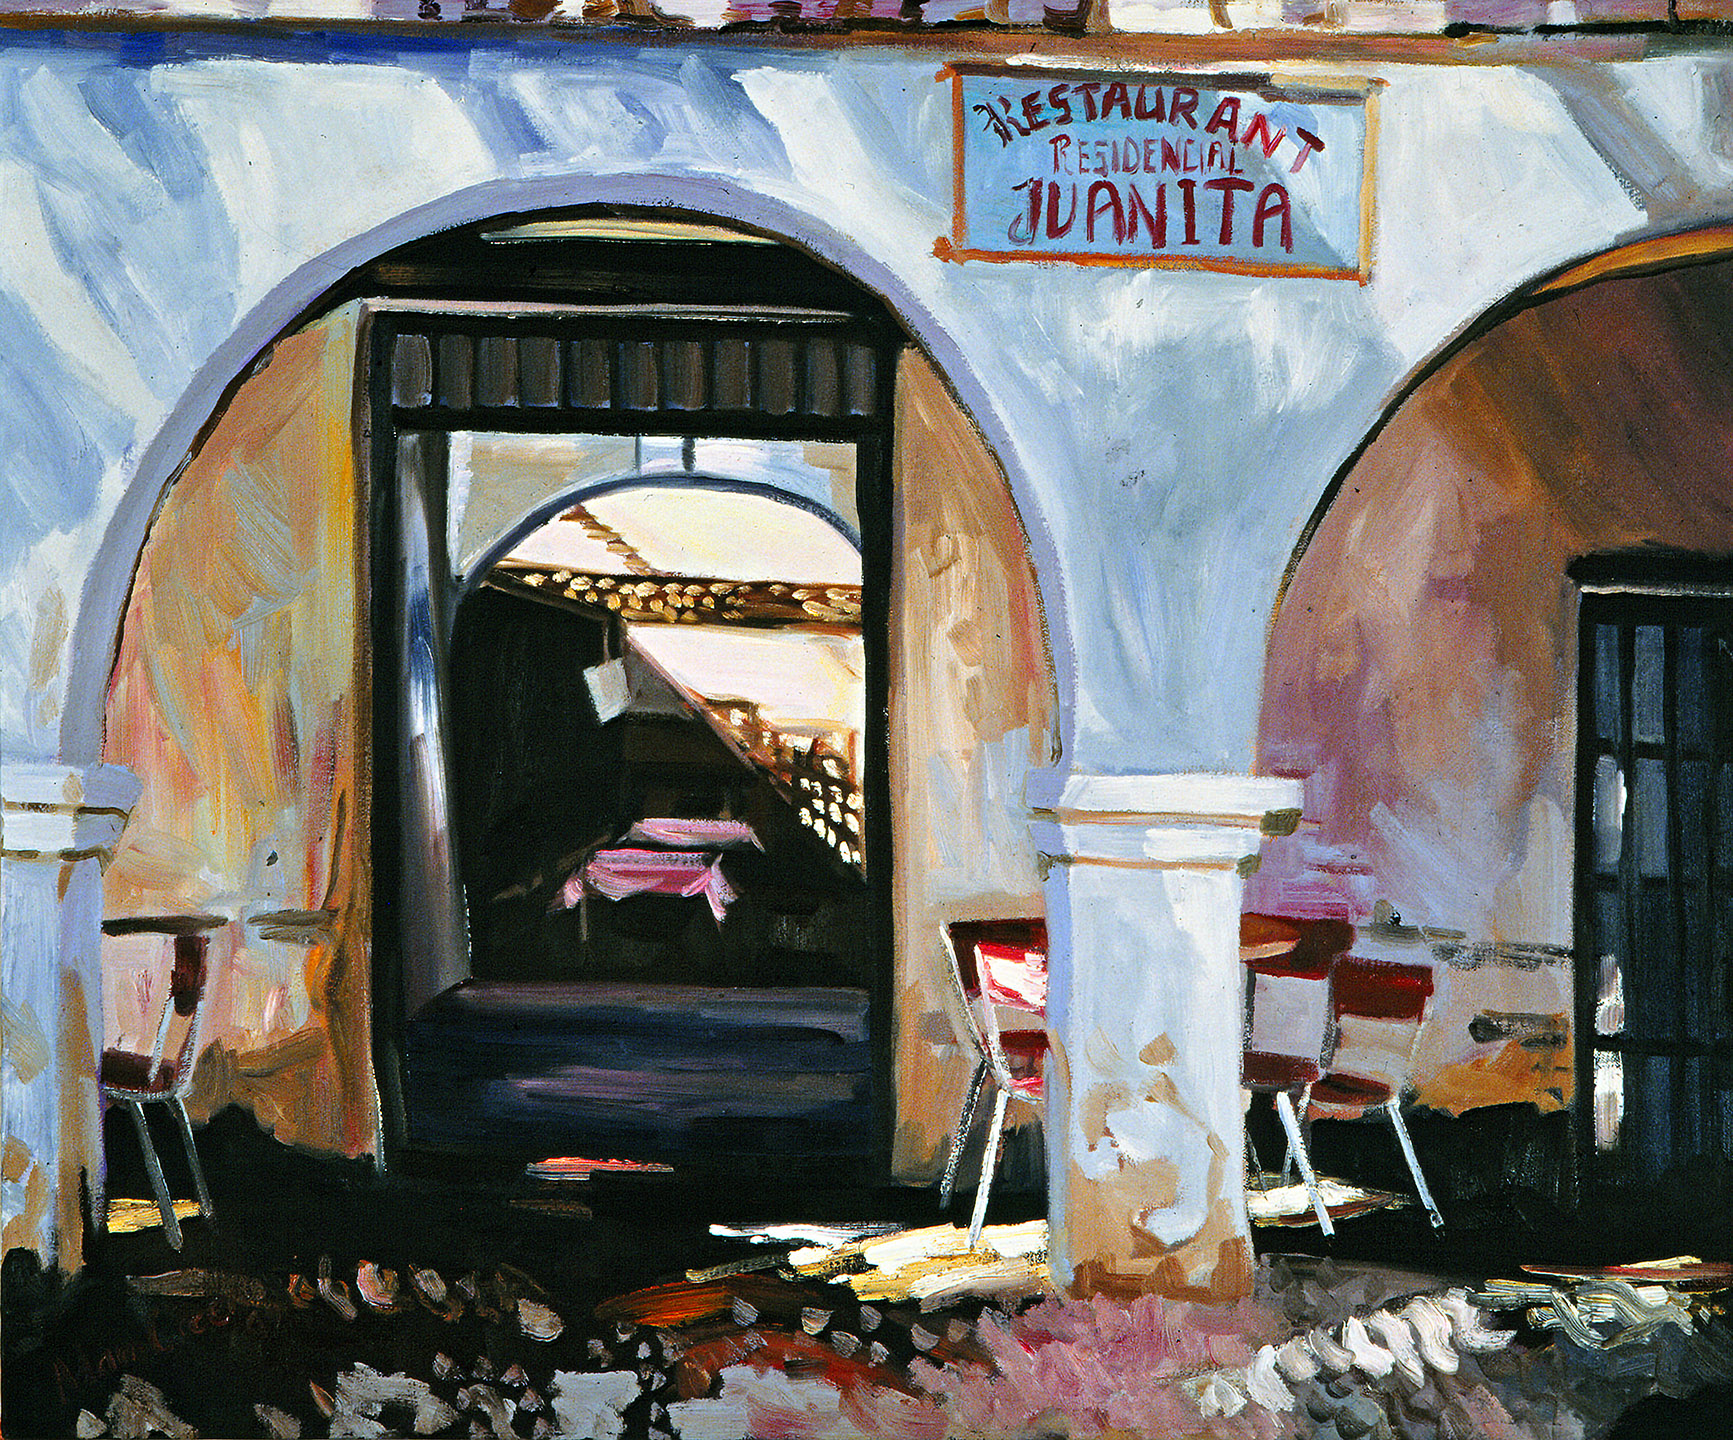 Juanita Restaurant.jpg